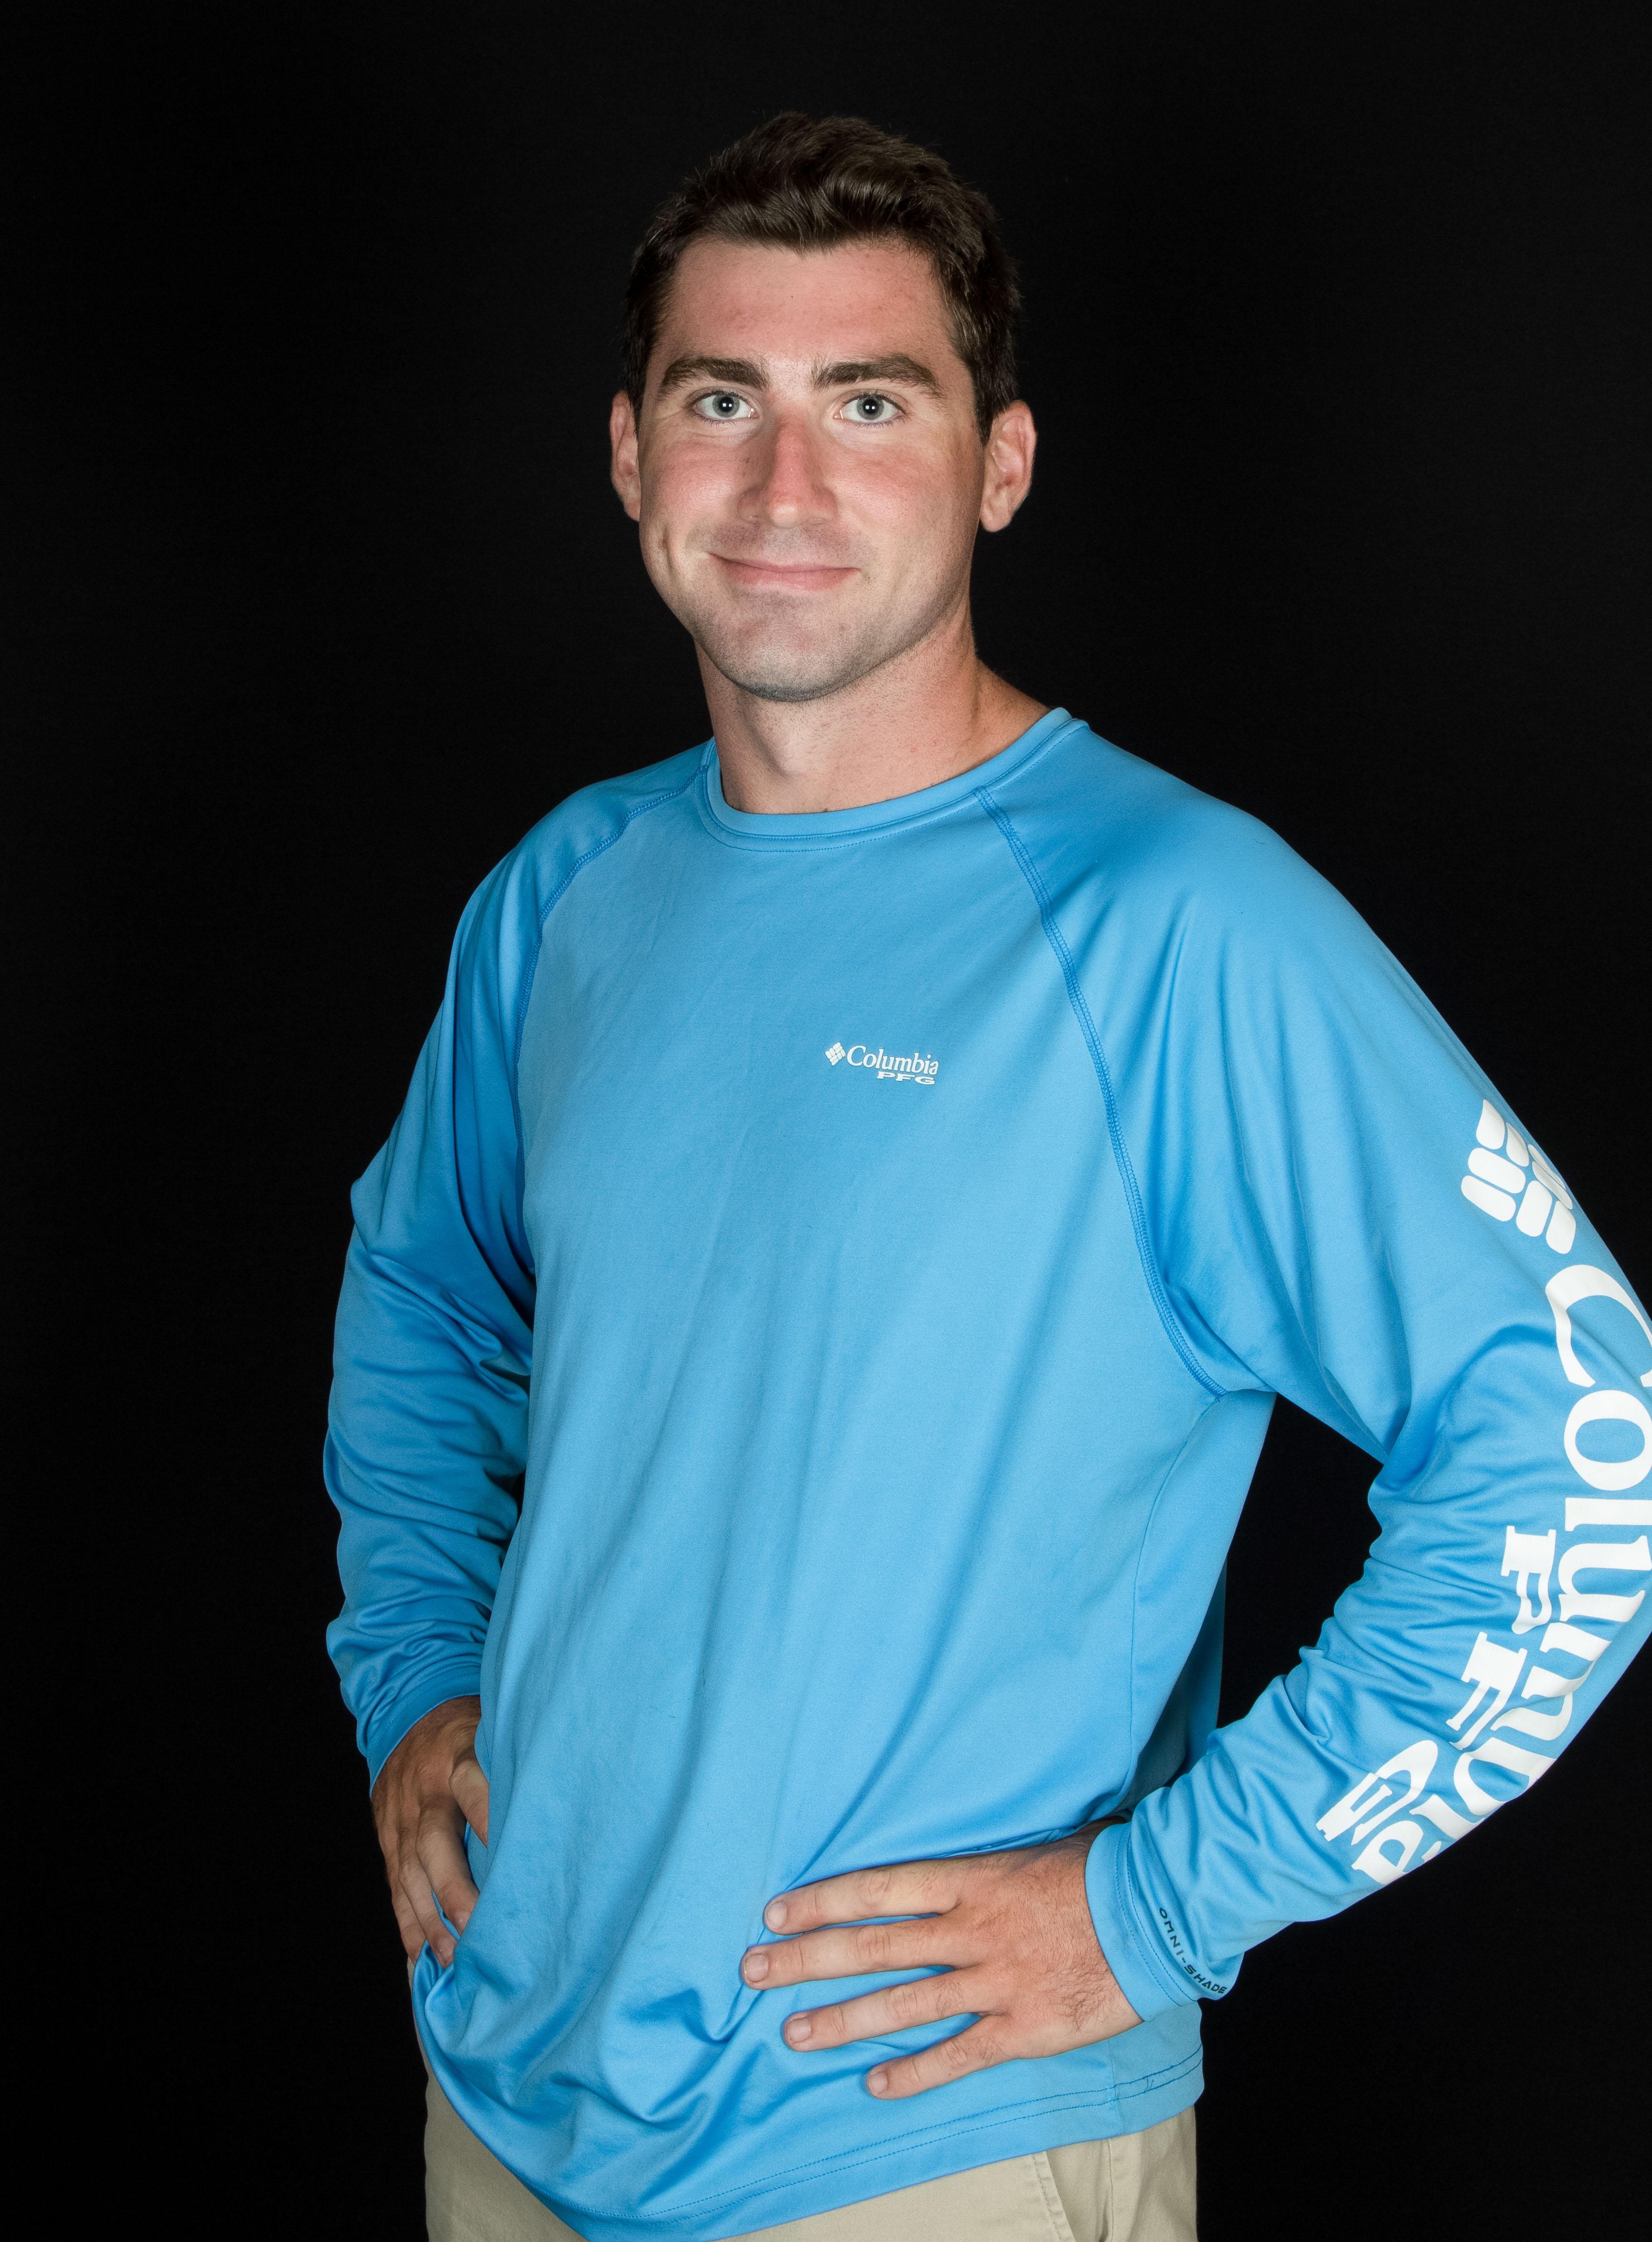 MLF Matthew Bouldin Profile